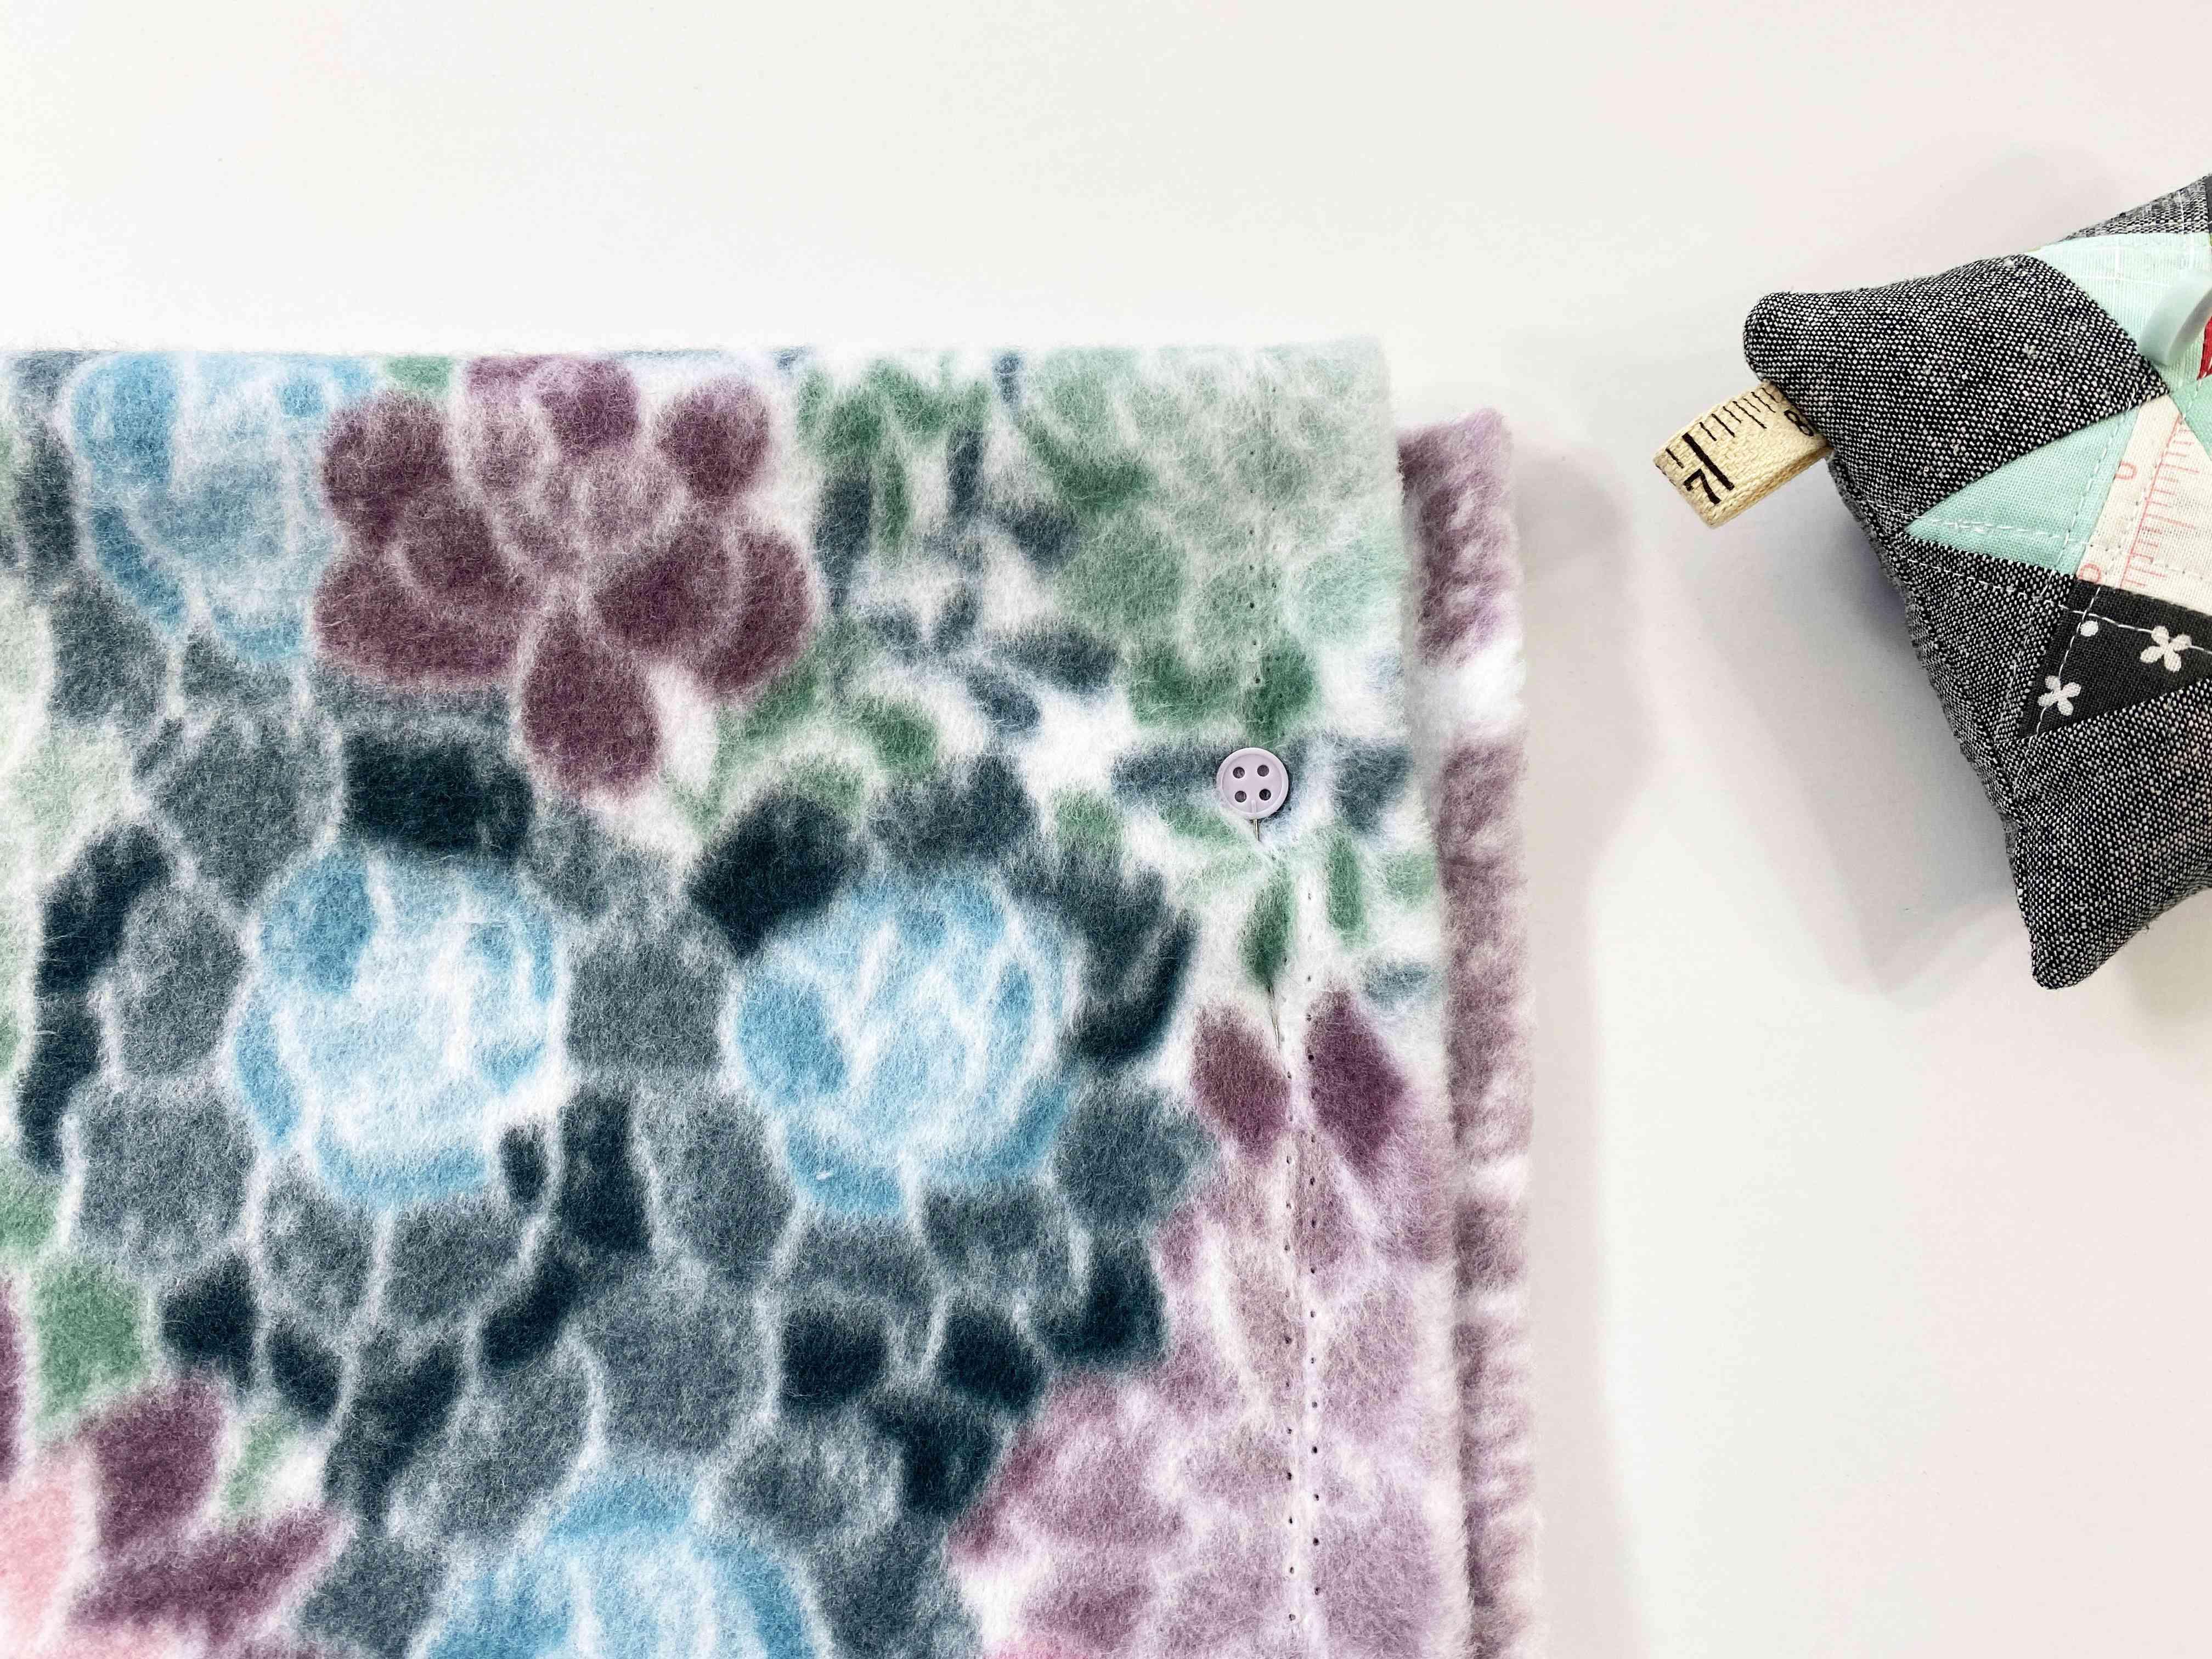 Fleece fabric and a pin cushion